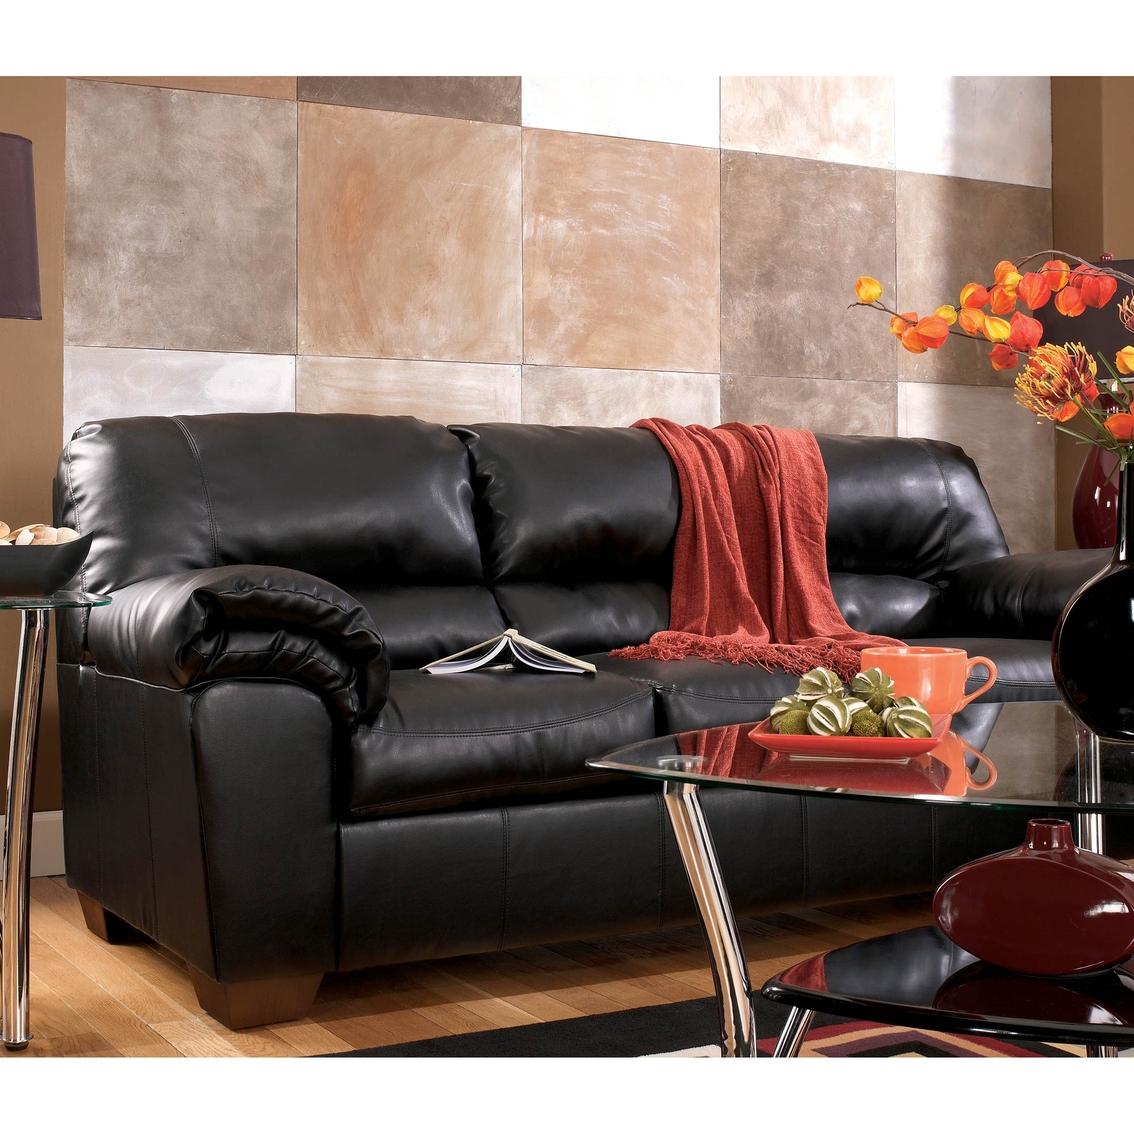 commando sofa